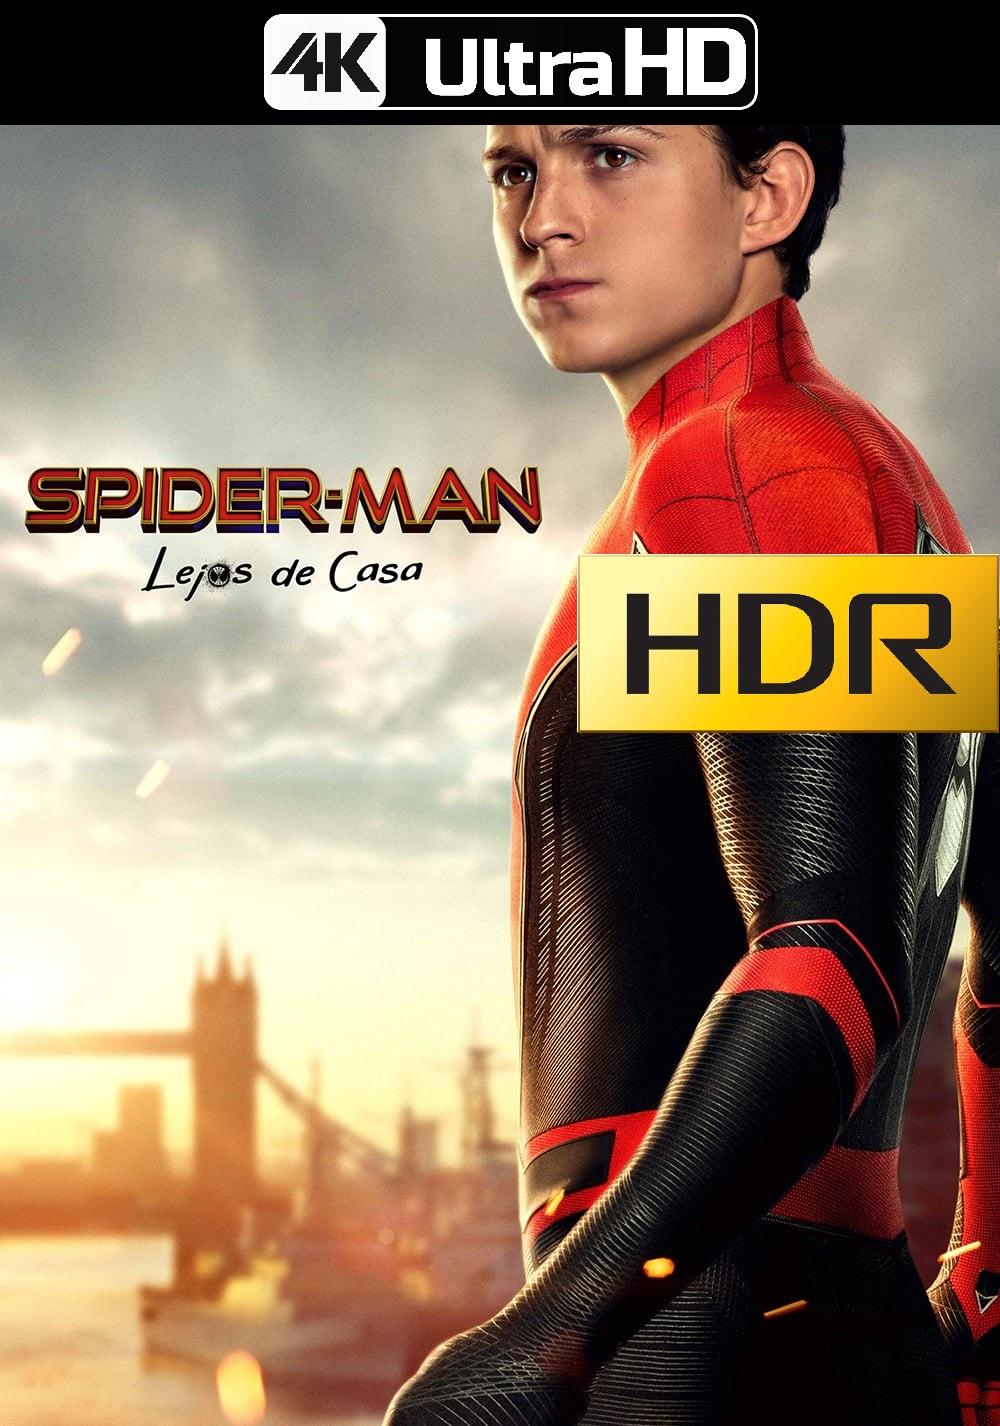 Spider-Man: Lejos de casa (2019) IMAX 4K UHD HDR Web-DL Latino